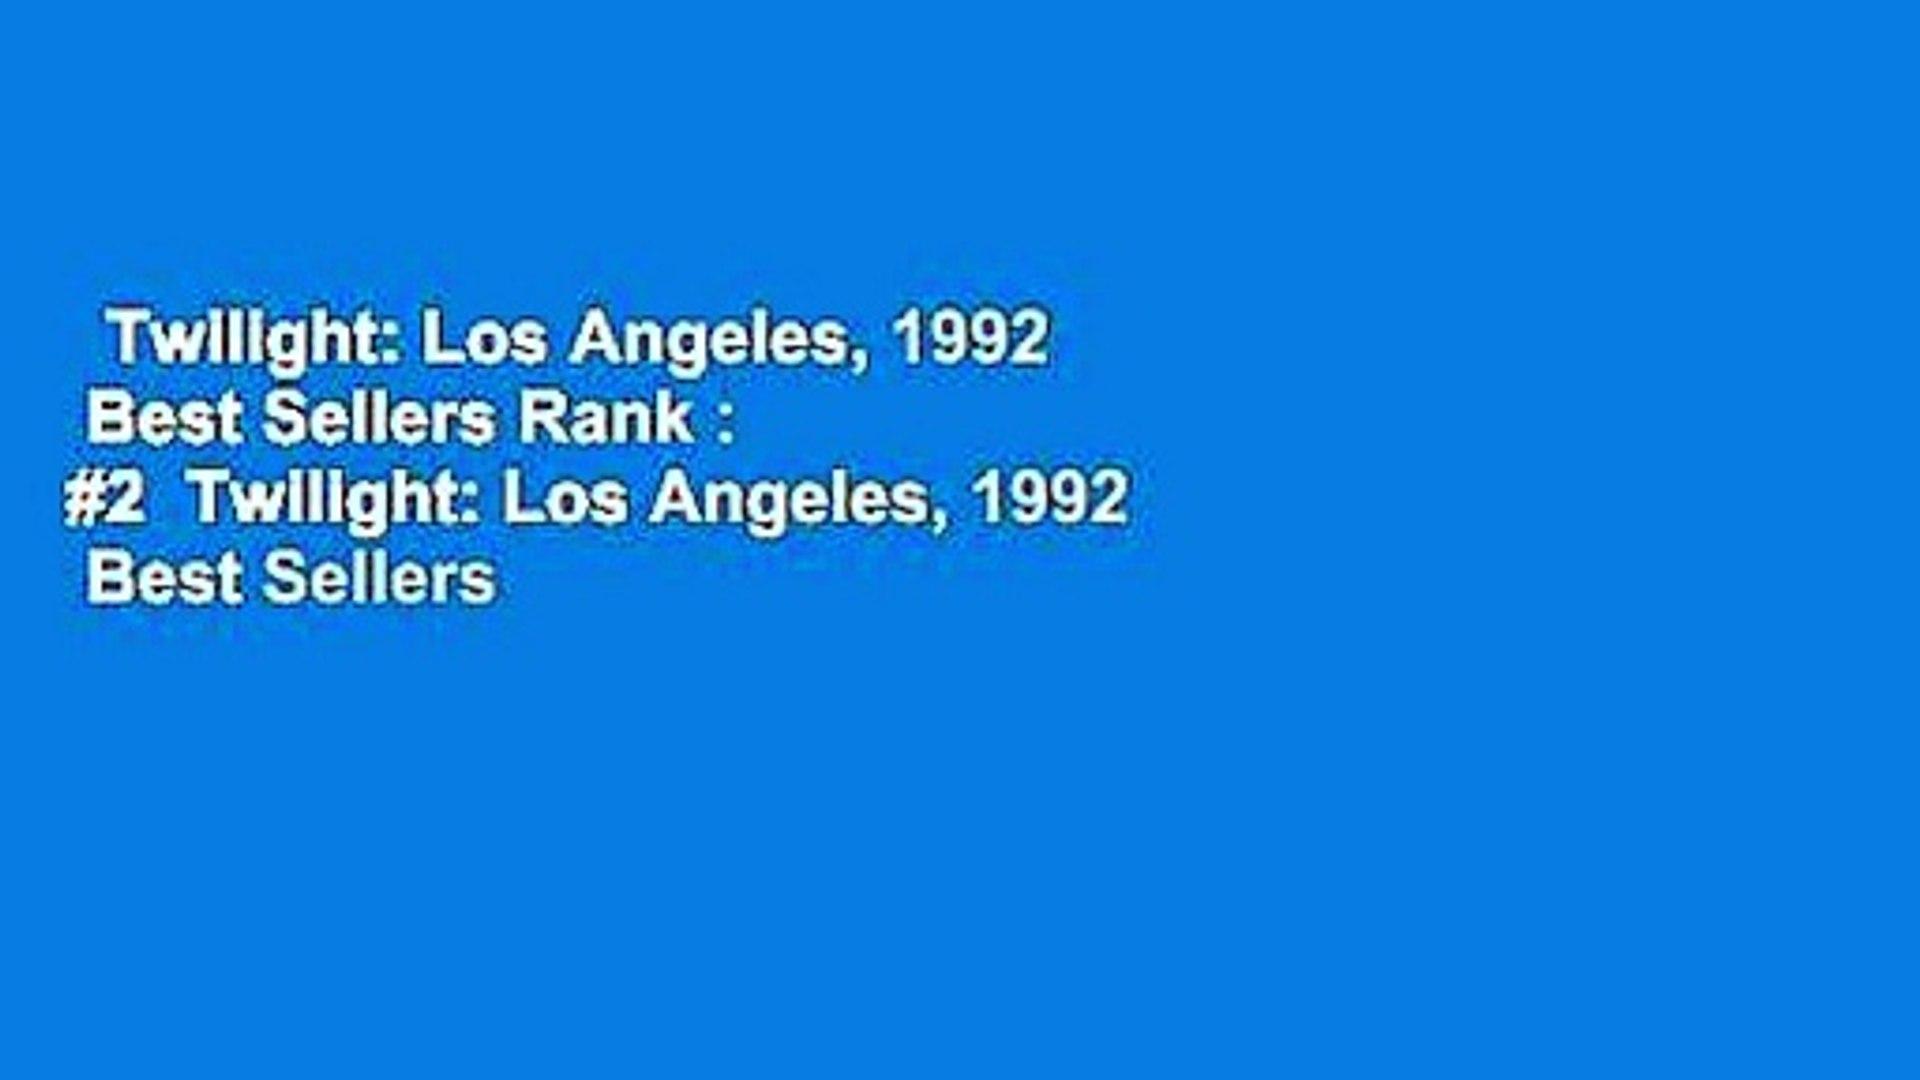 Twilight: Los Angeles, 1992  Best Sellers Rank : #2  Twilight: Los Angeles, 1992  Best Sellers